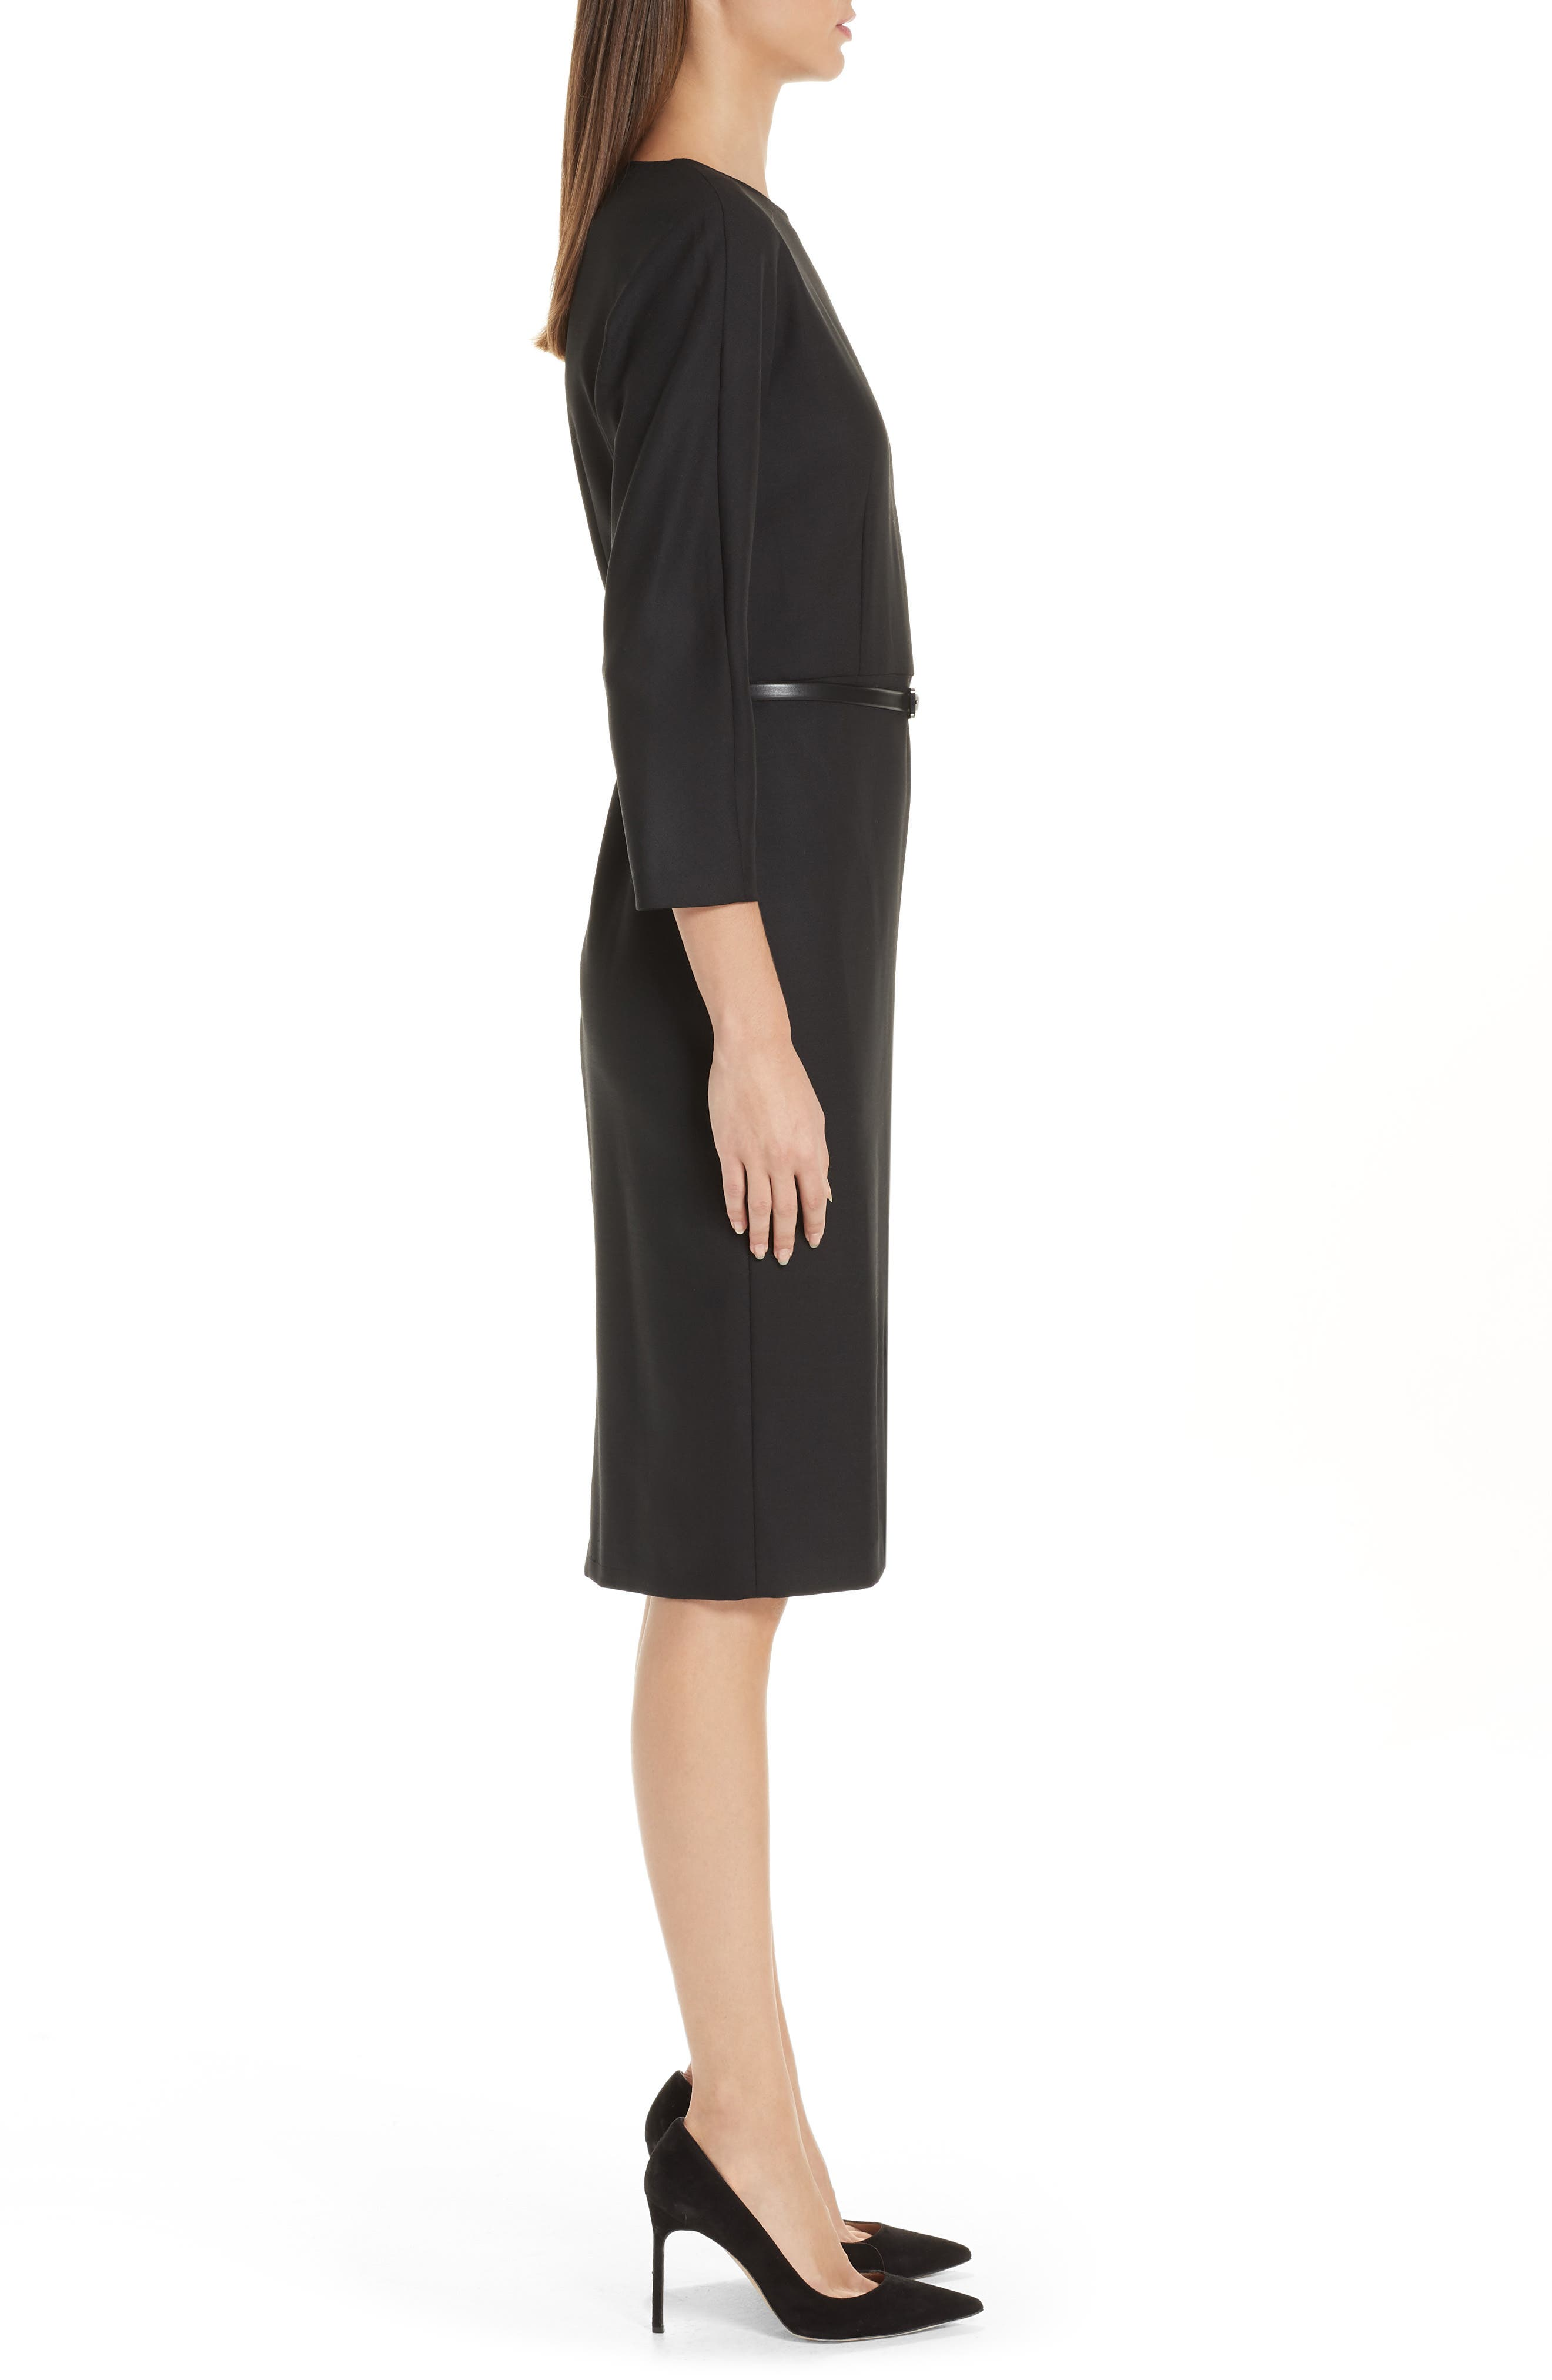 MAX MARA,                             Karub Belted Stretch Wool Dress,                             Alternate thumbnail 3, color,                             001